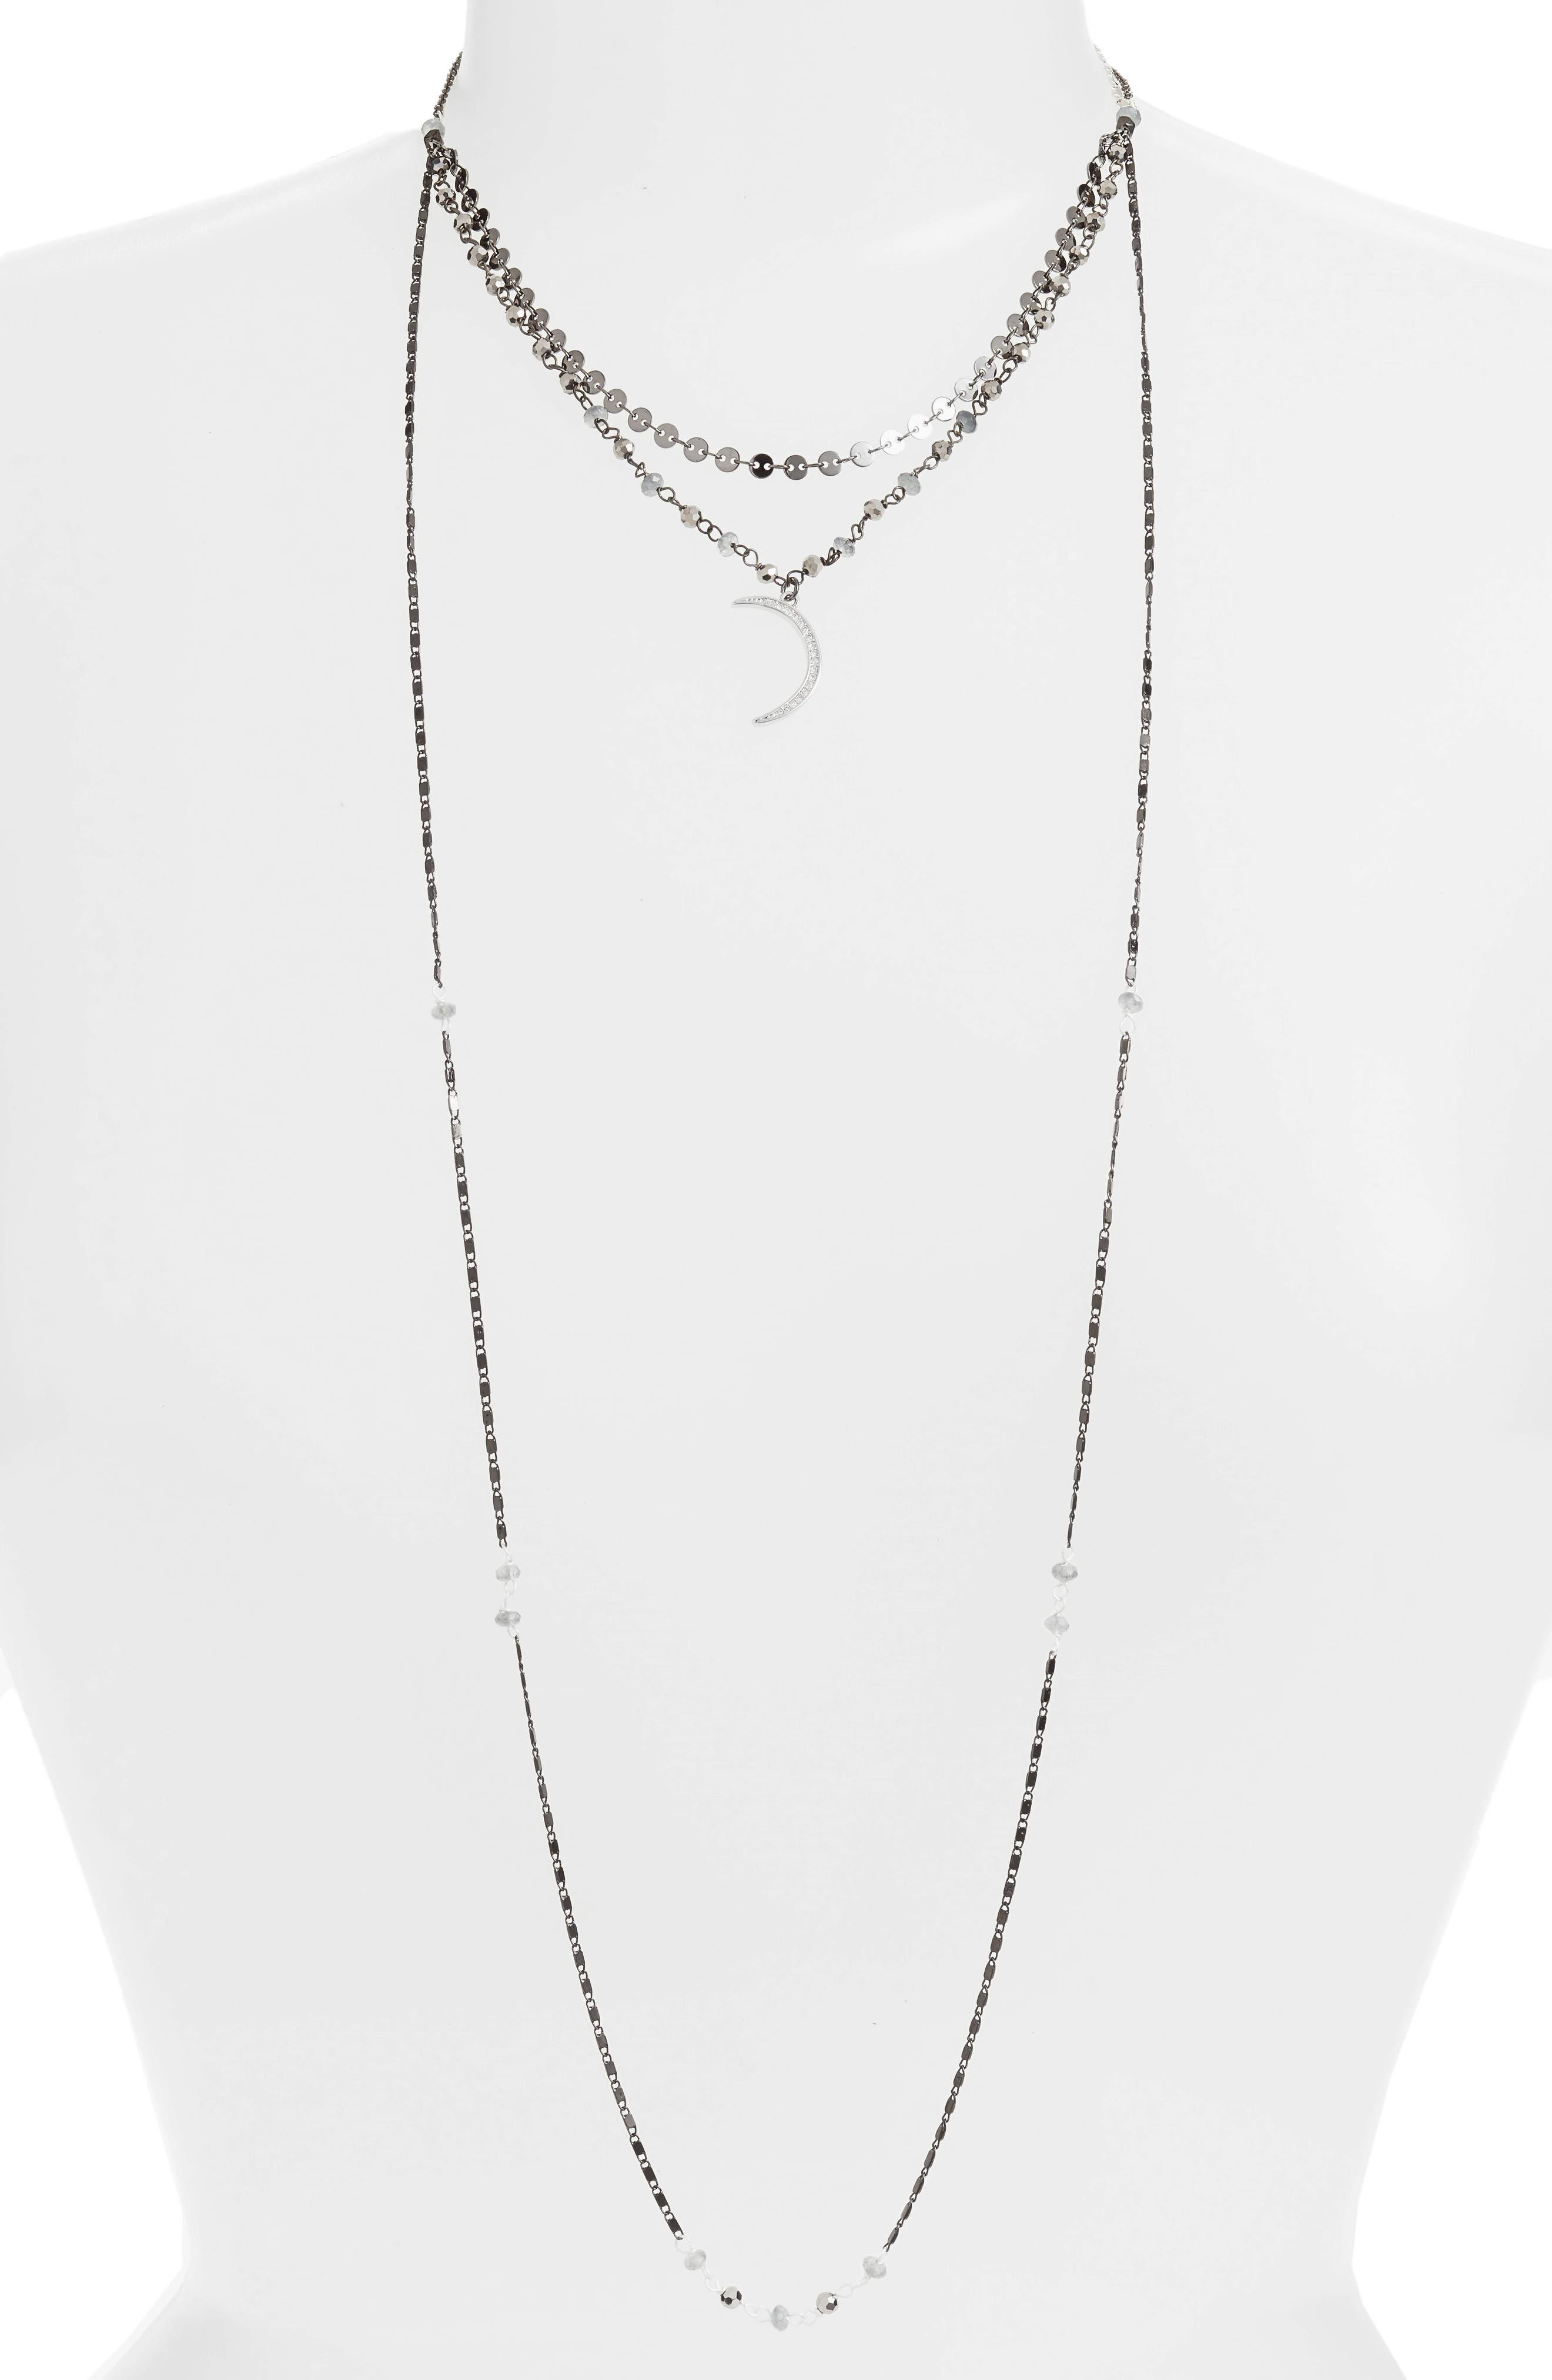 Moon Charm Layered Necklace,                             Main thumbnail 1, color,                             020